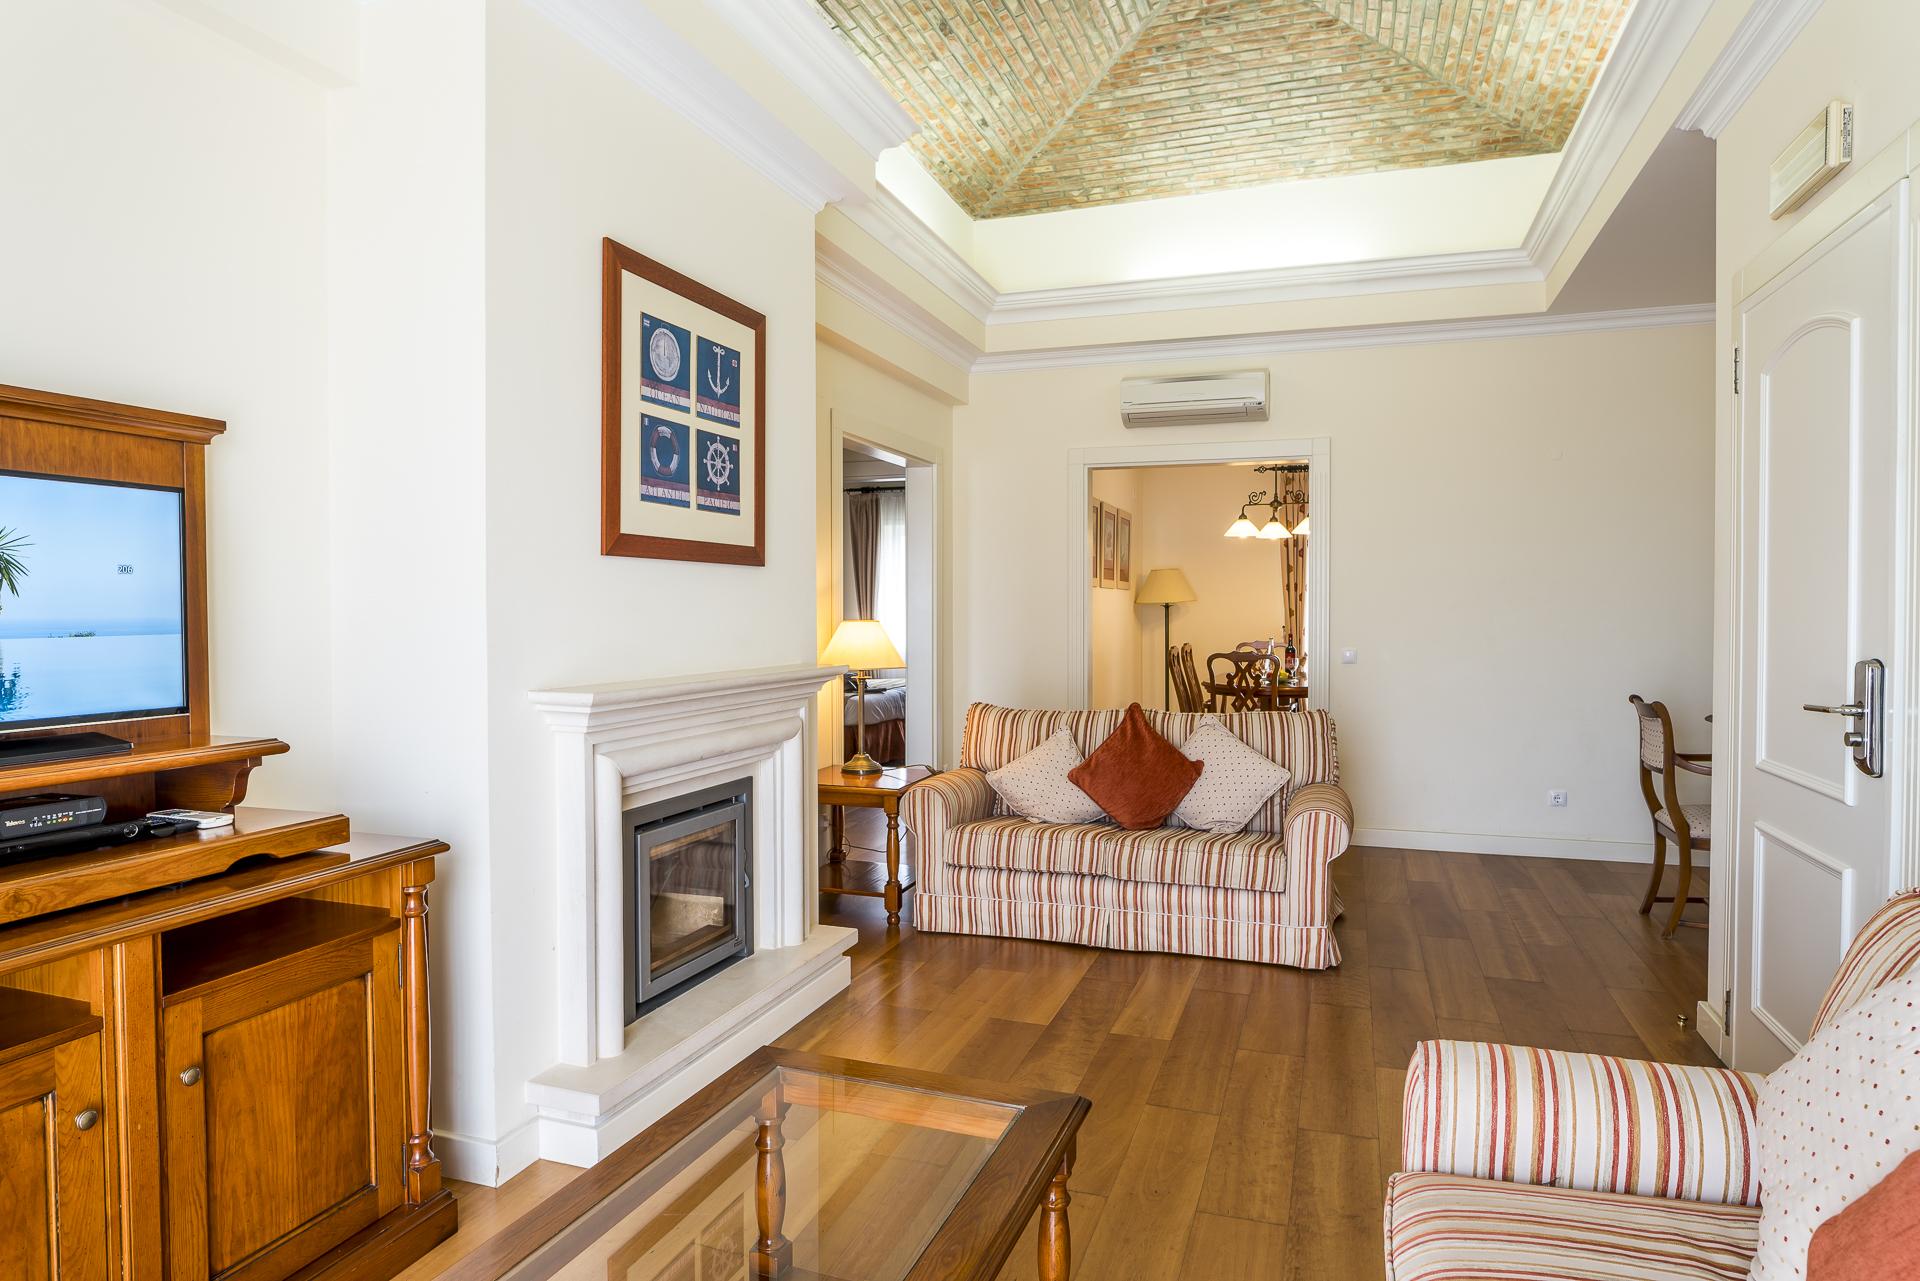 Suites Alba Resorts and Spa Algarve Zimmer